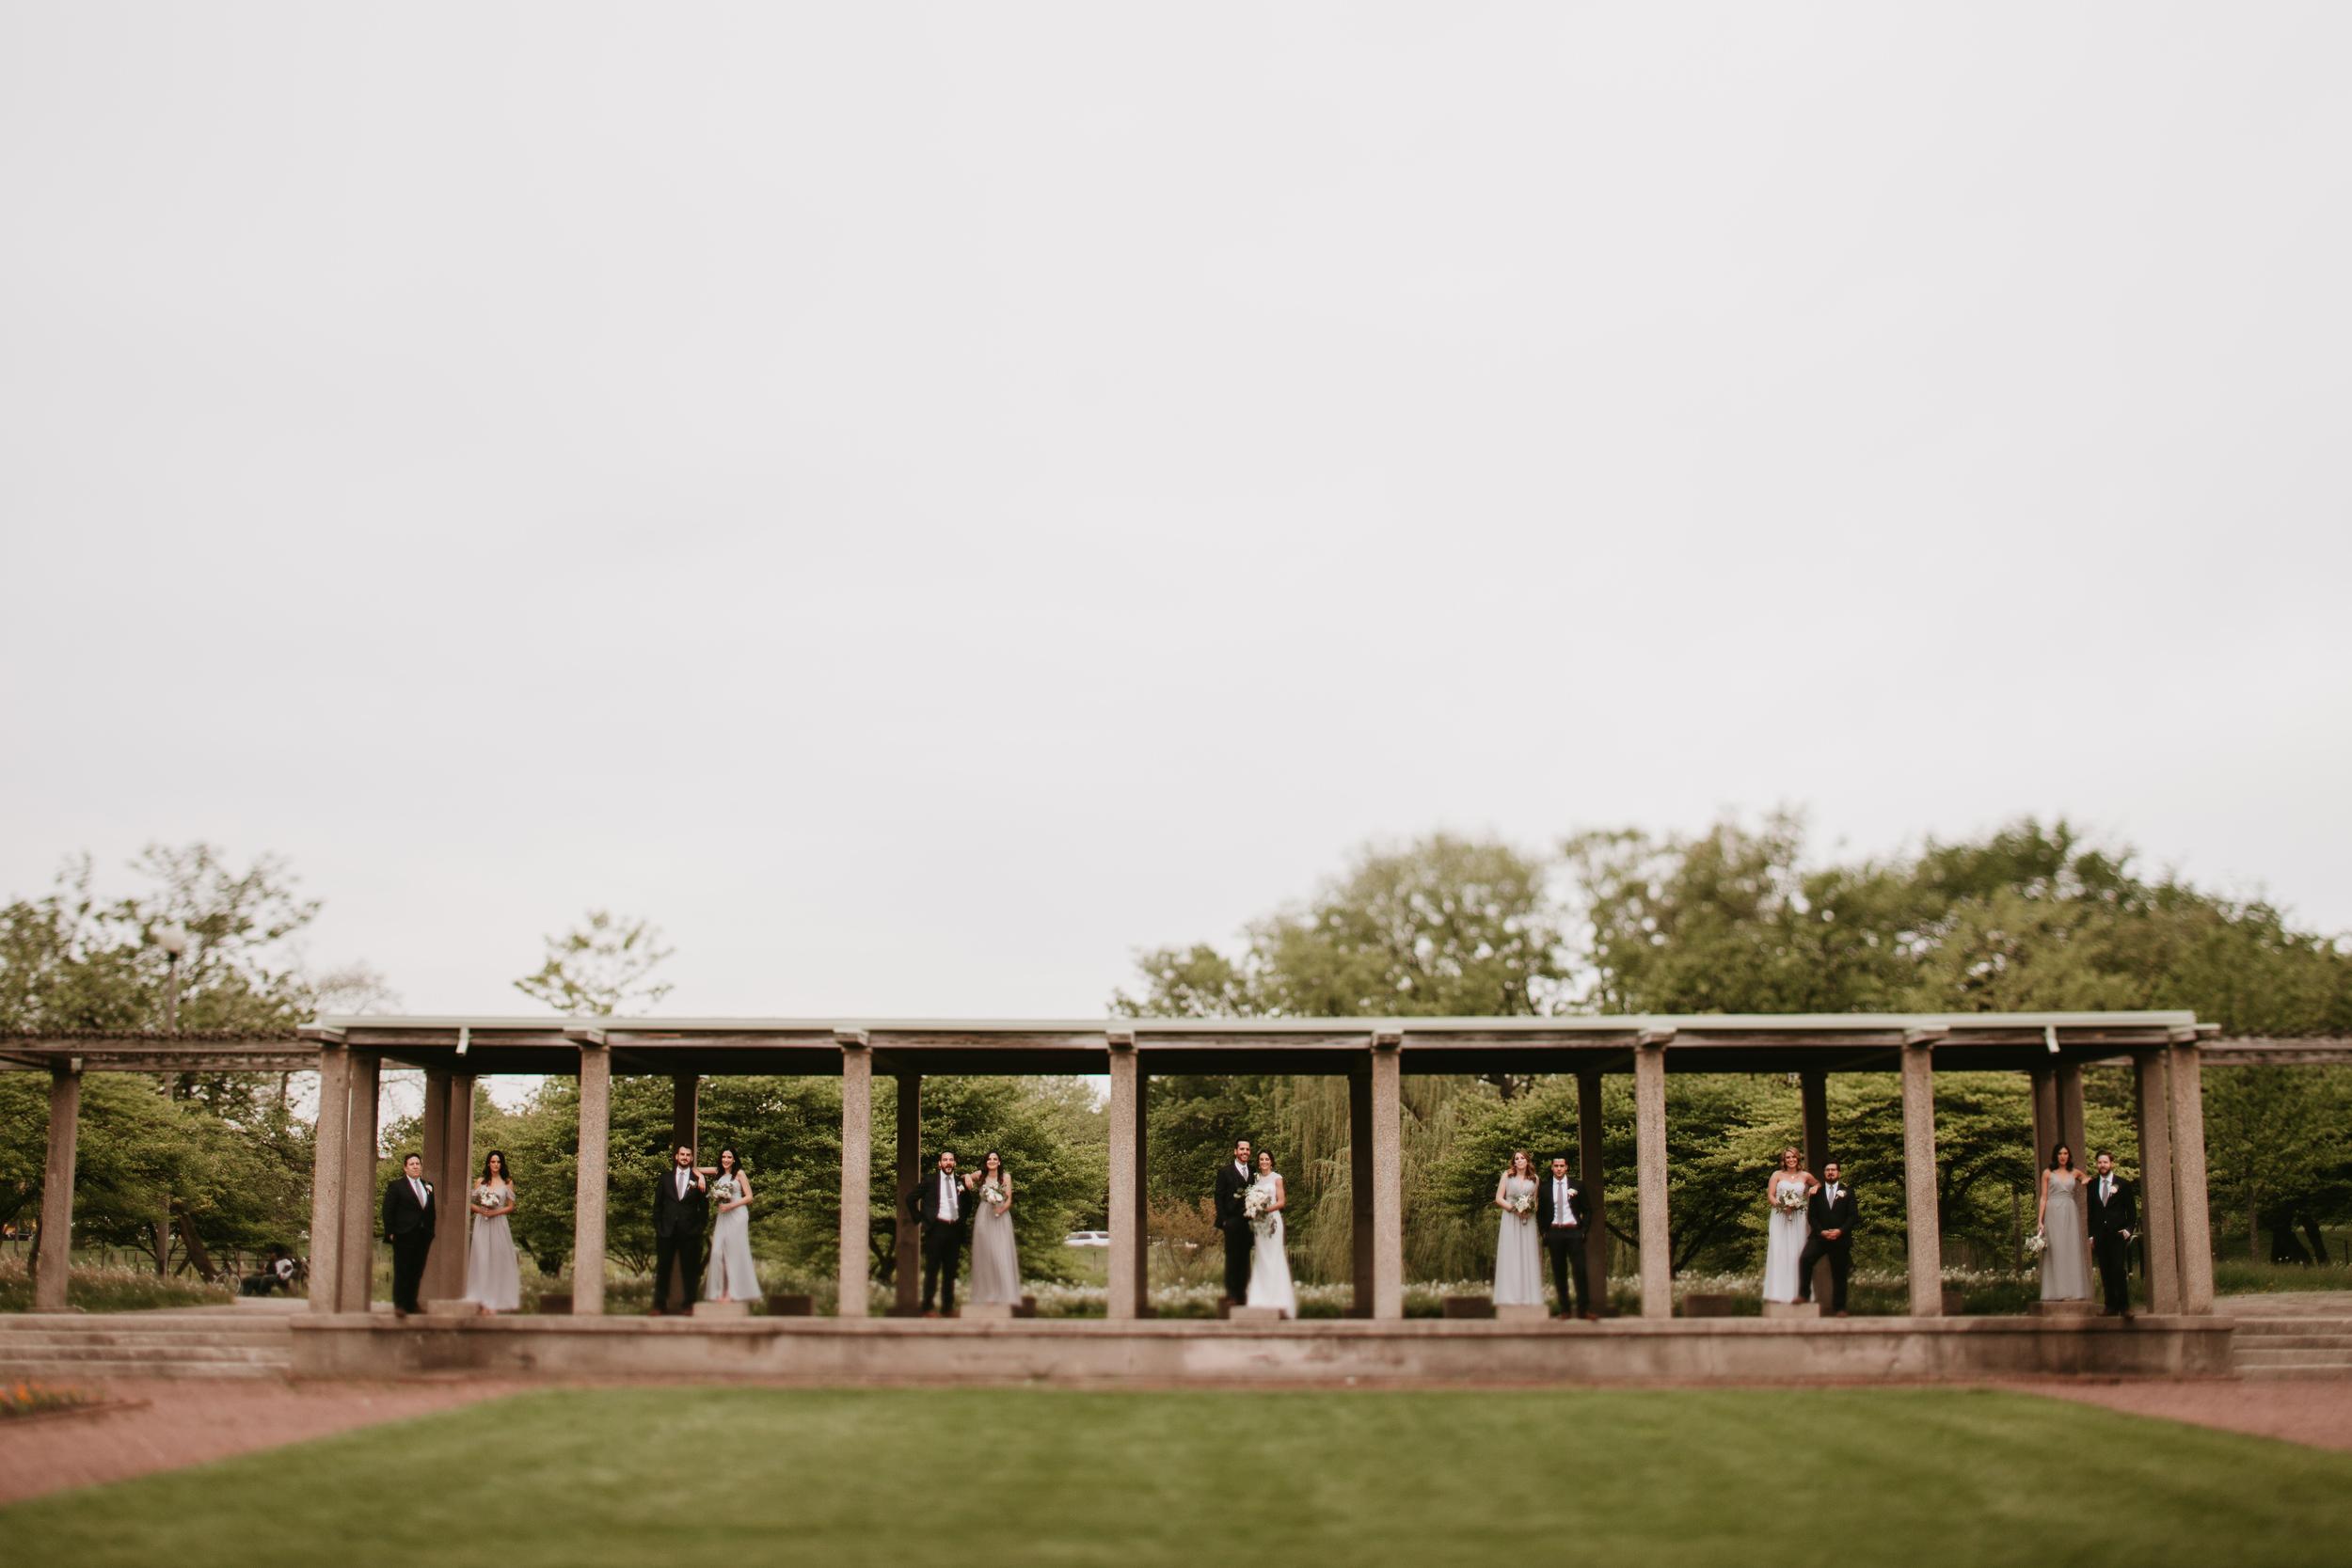 chicago park bridal party photos